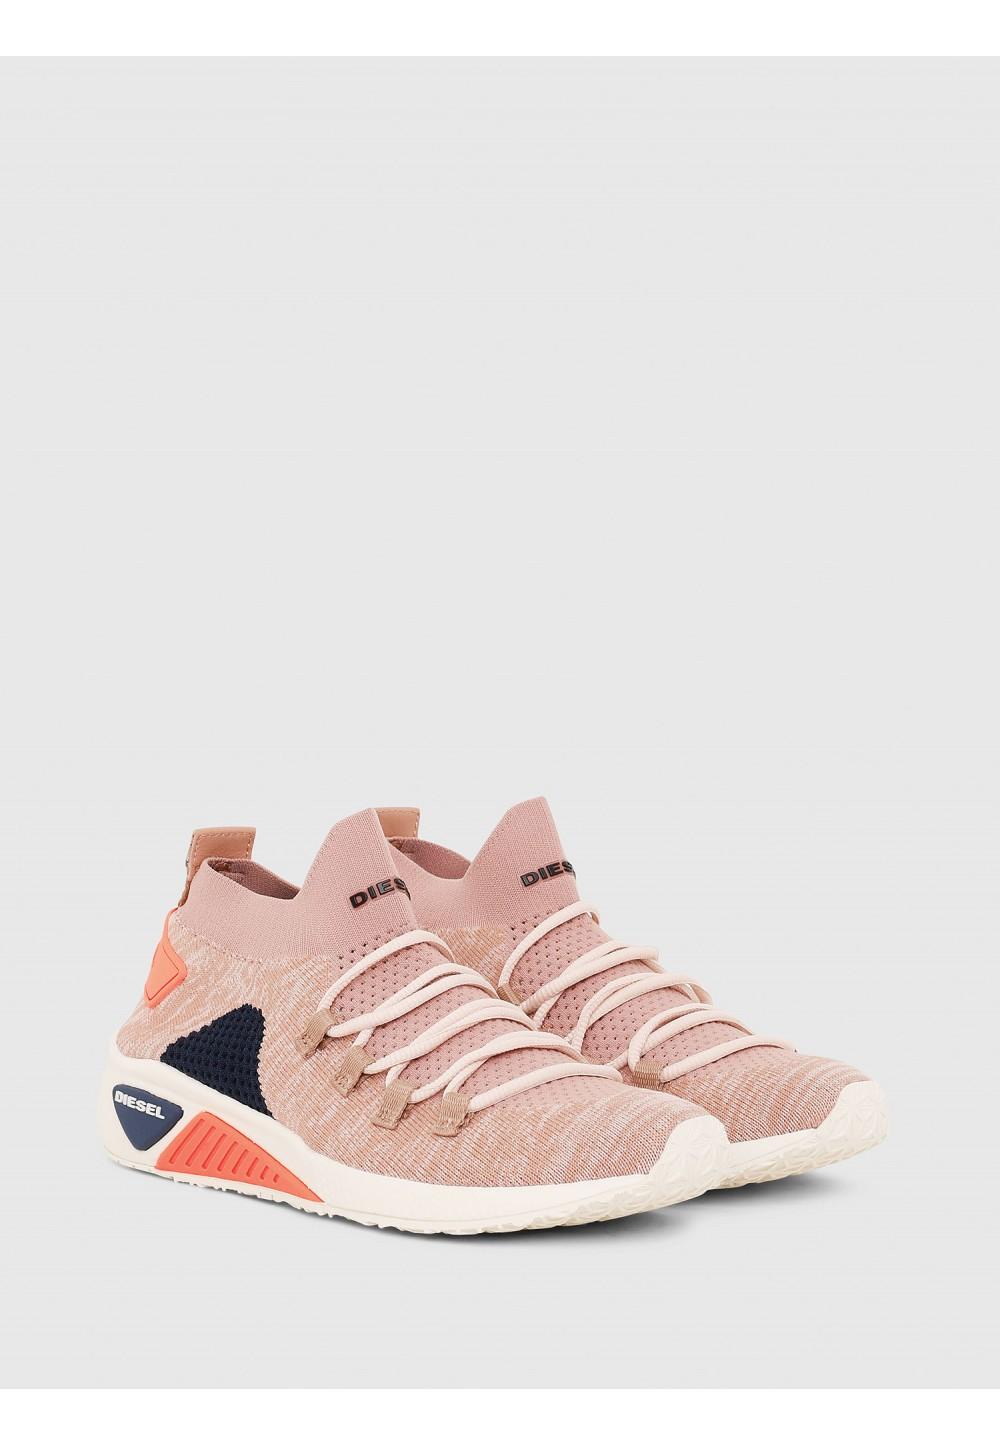 Кроссовки - носки на шнуровке